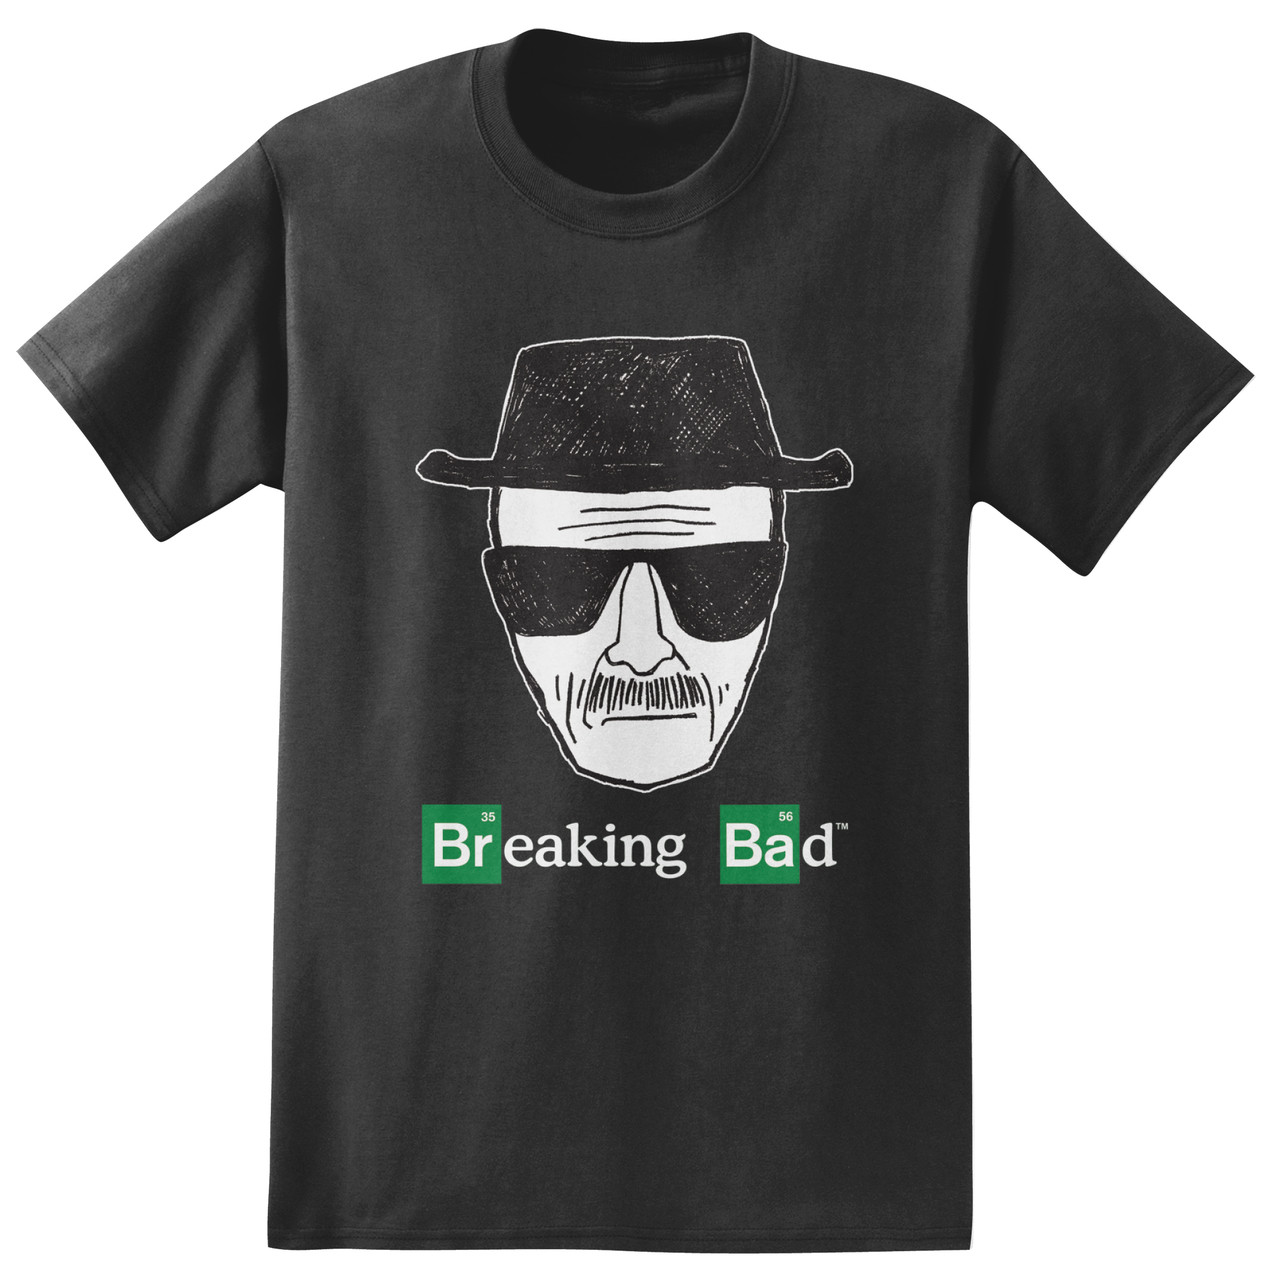 f8eda48abfa4 Breaking Bad T-Shirt - Heisenberg Sketch. Loading zoom